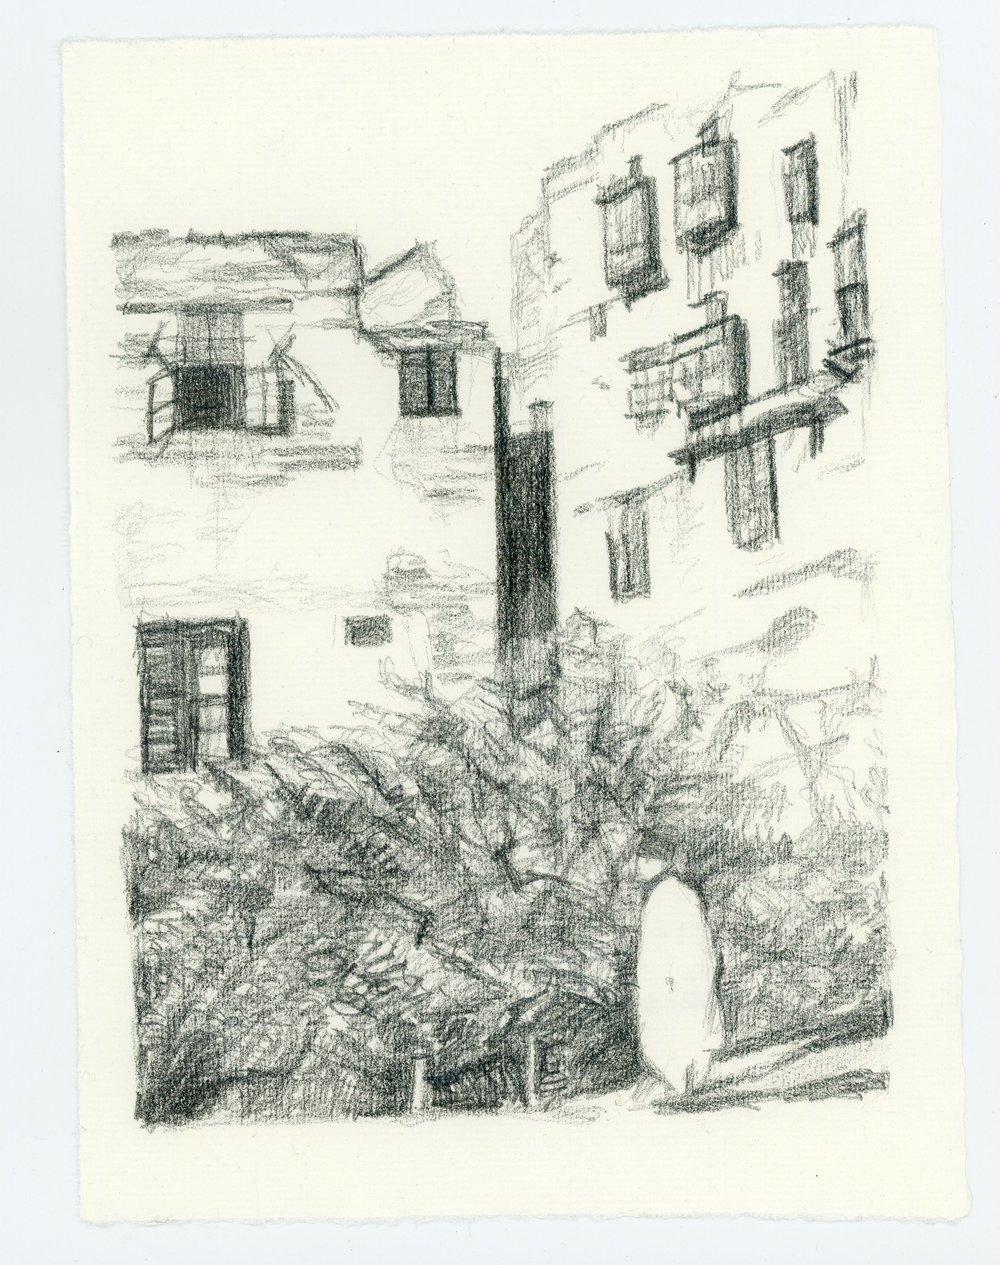 Flaubert in Cairo